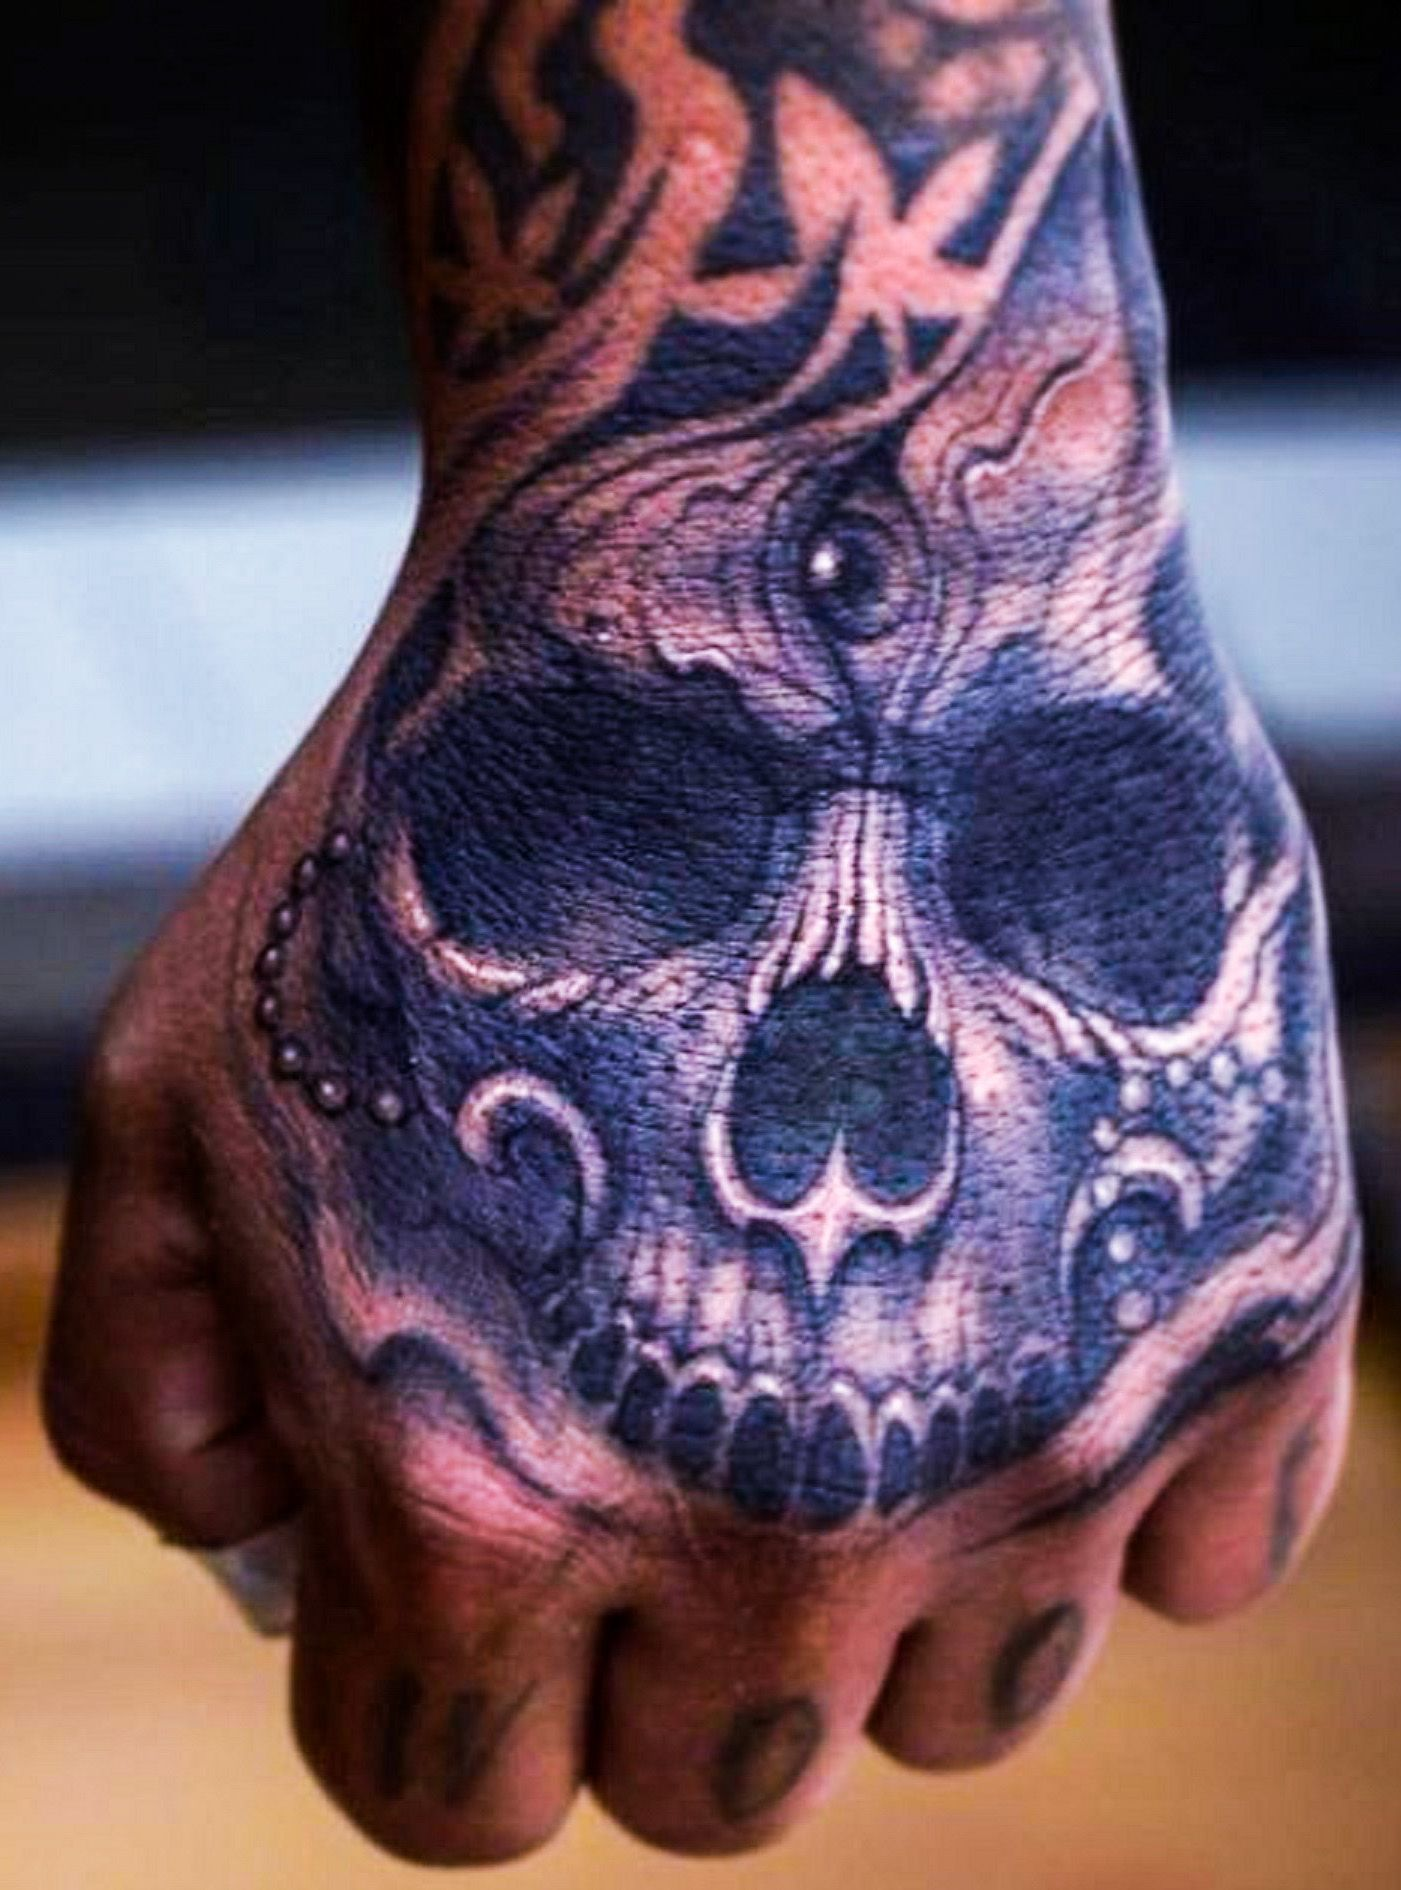 Skull Hand Tattoo Hand tattoos for guys, Skull hand